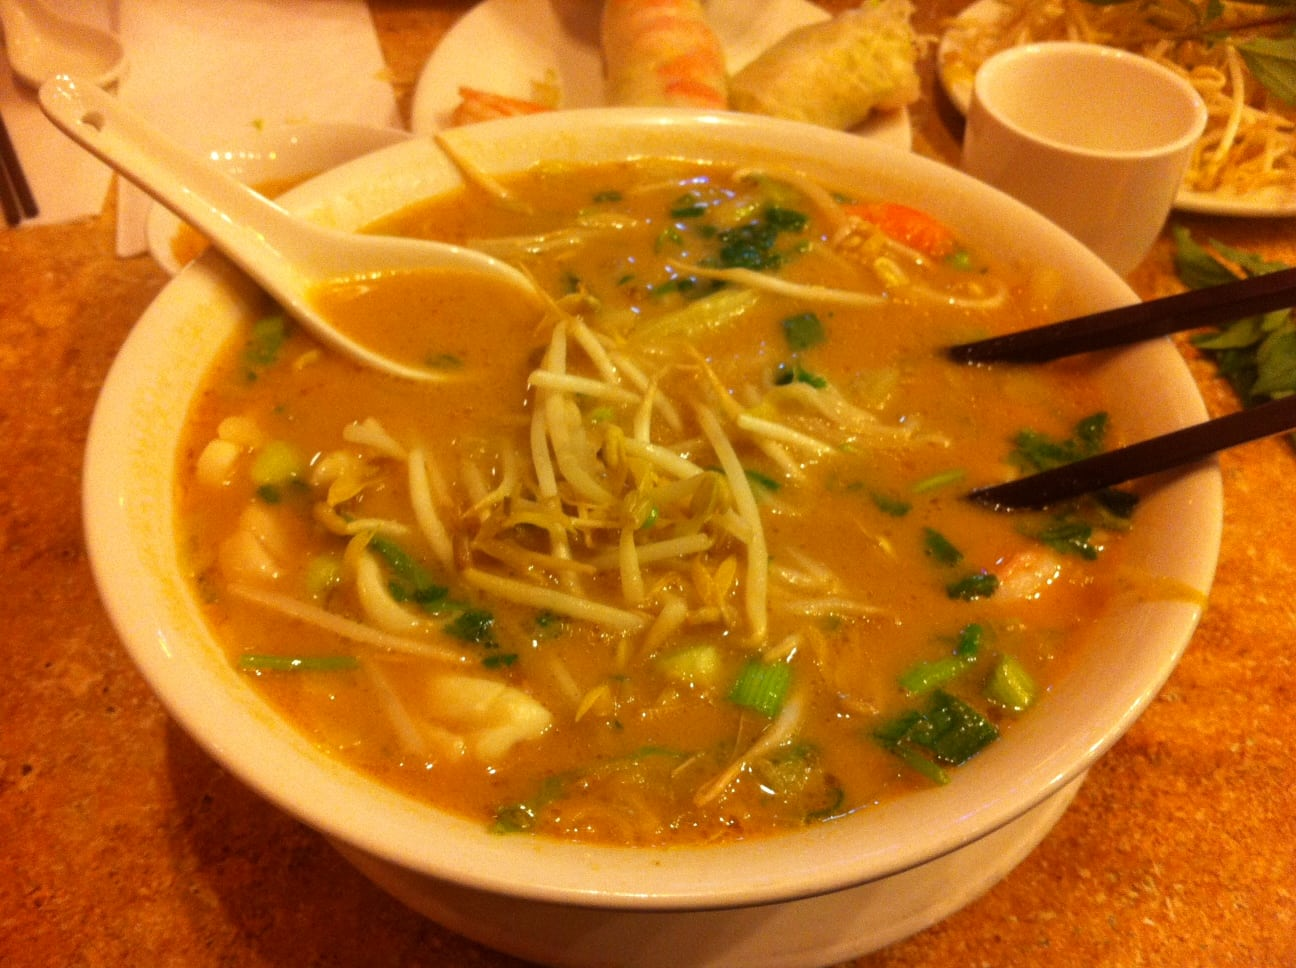 Golden Bell Saigon Calgary Pho Resaurant - Beef Noodle Soup